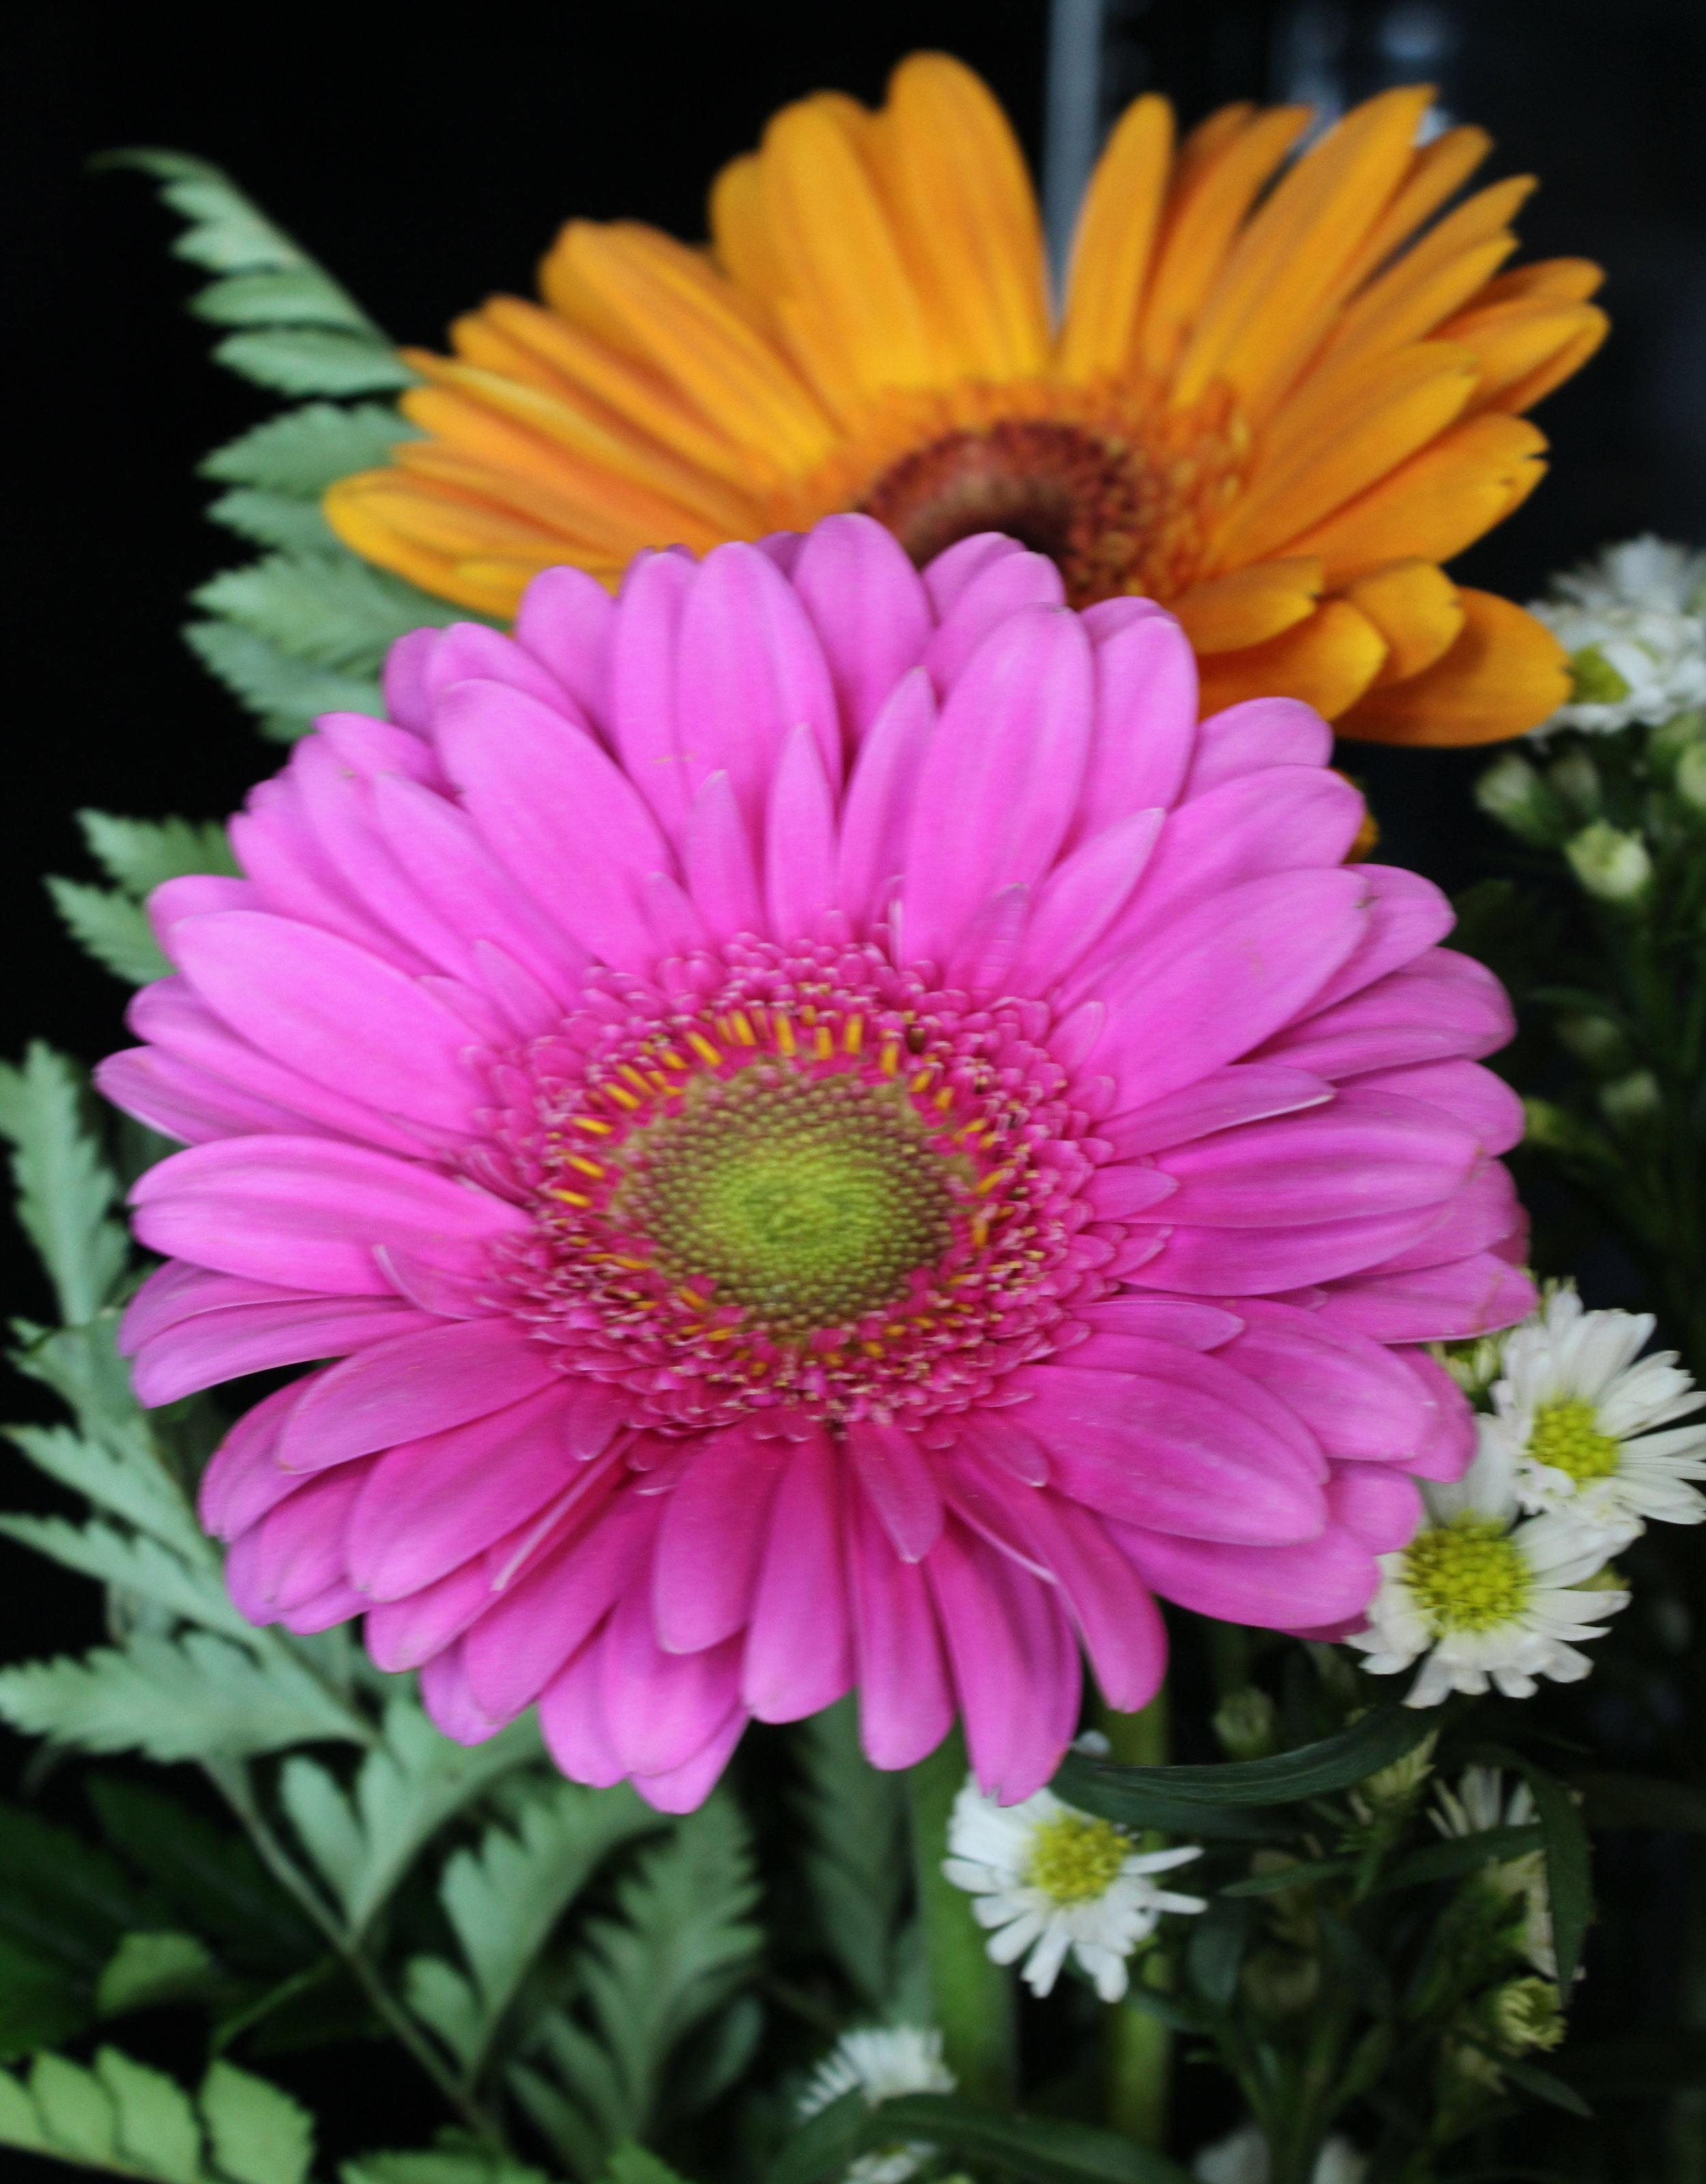 lovejoy flowers flower b.jpg